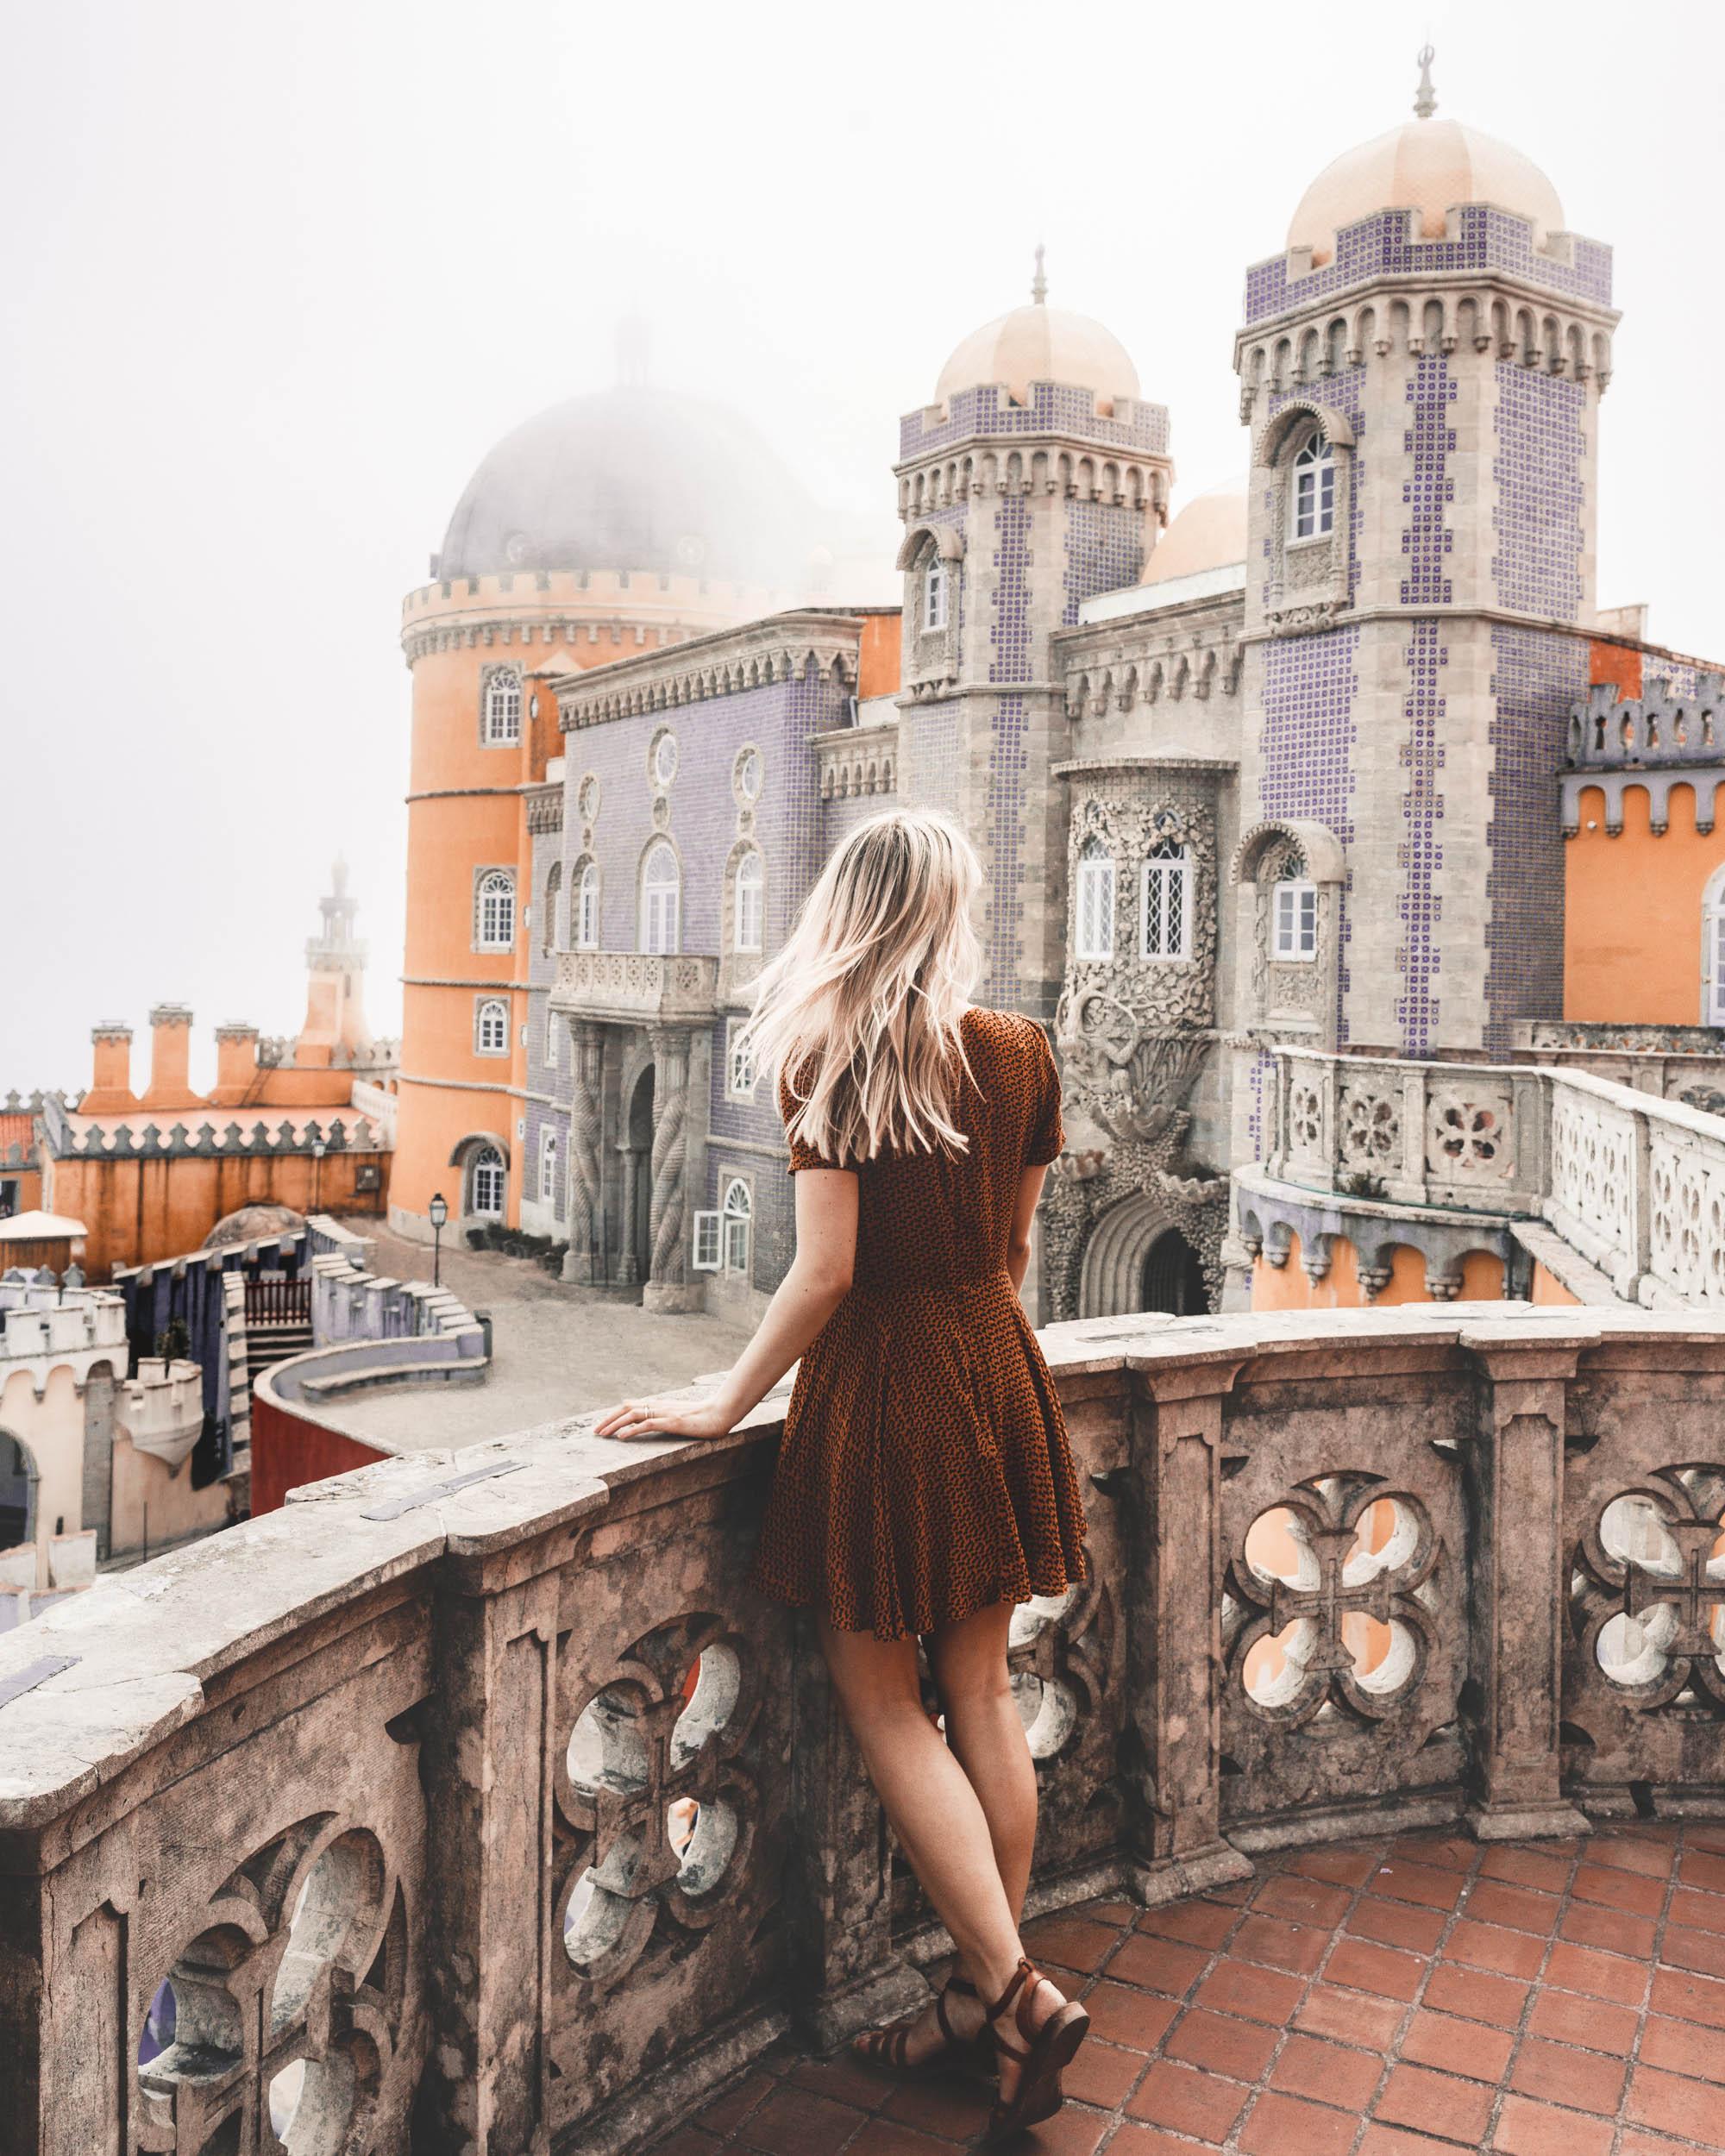 Pena Palace castle photo spot in Sintra Portugal via @finduslost